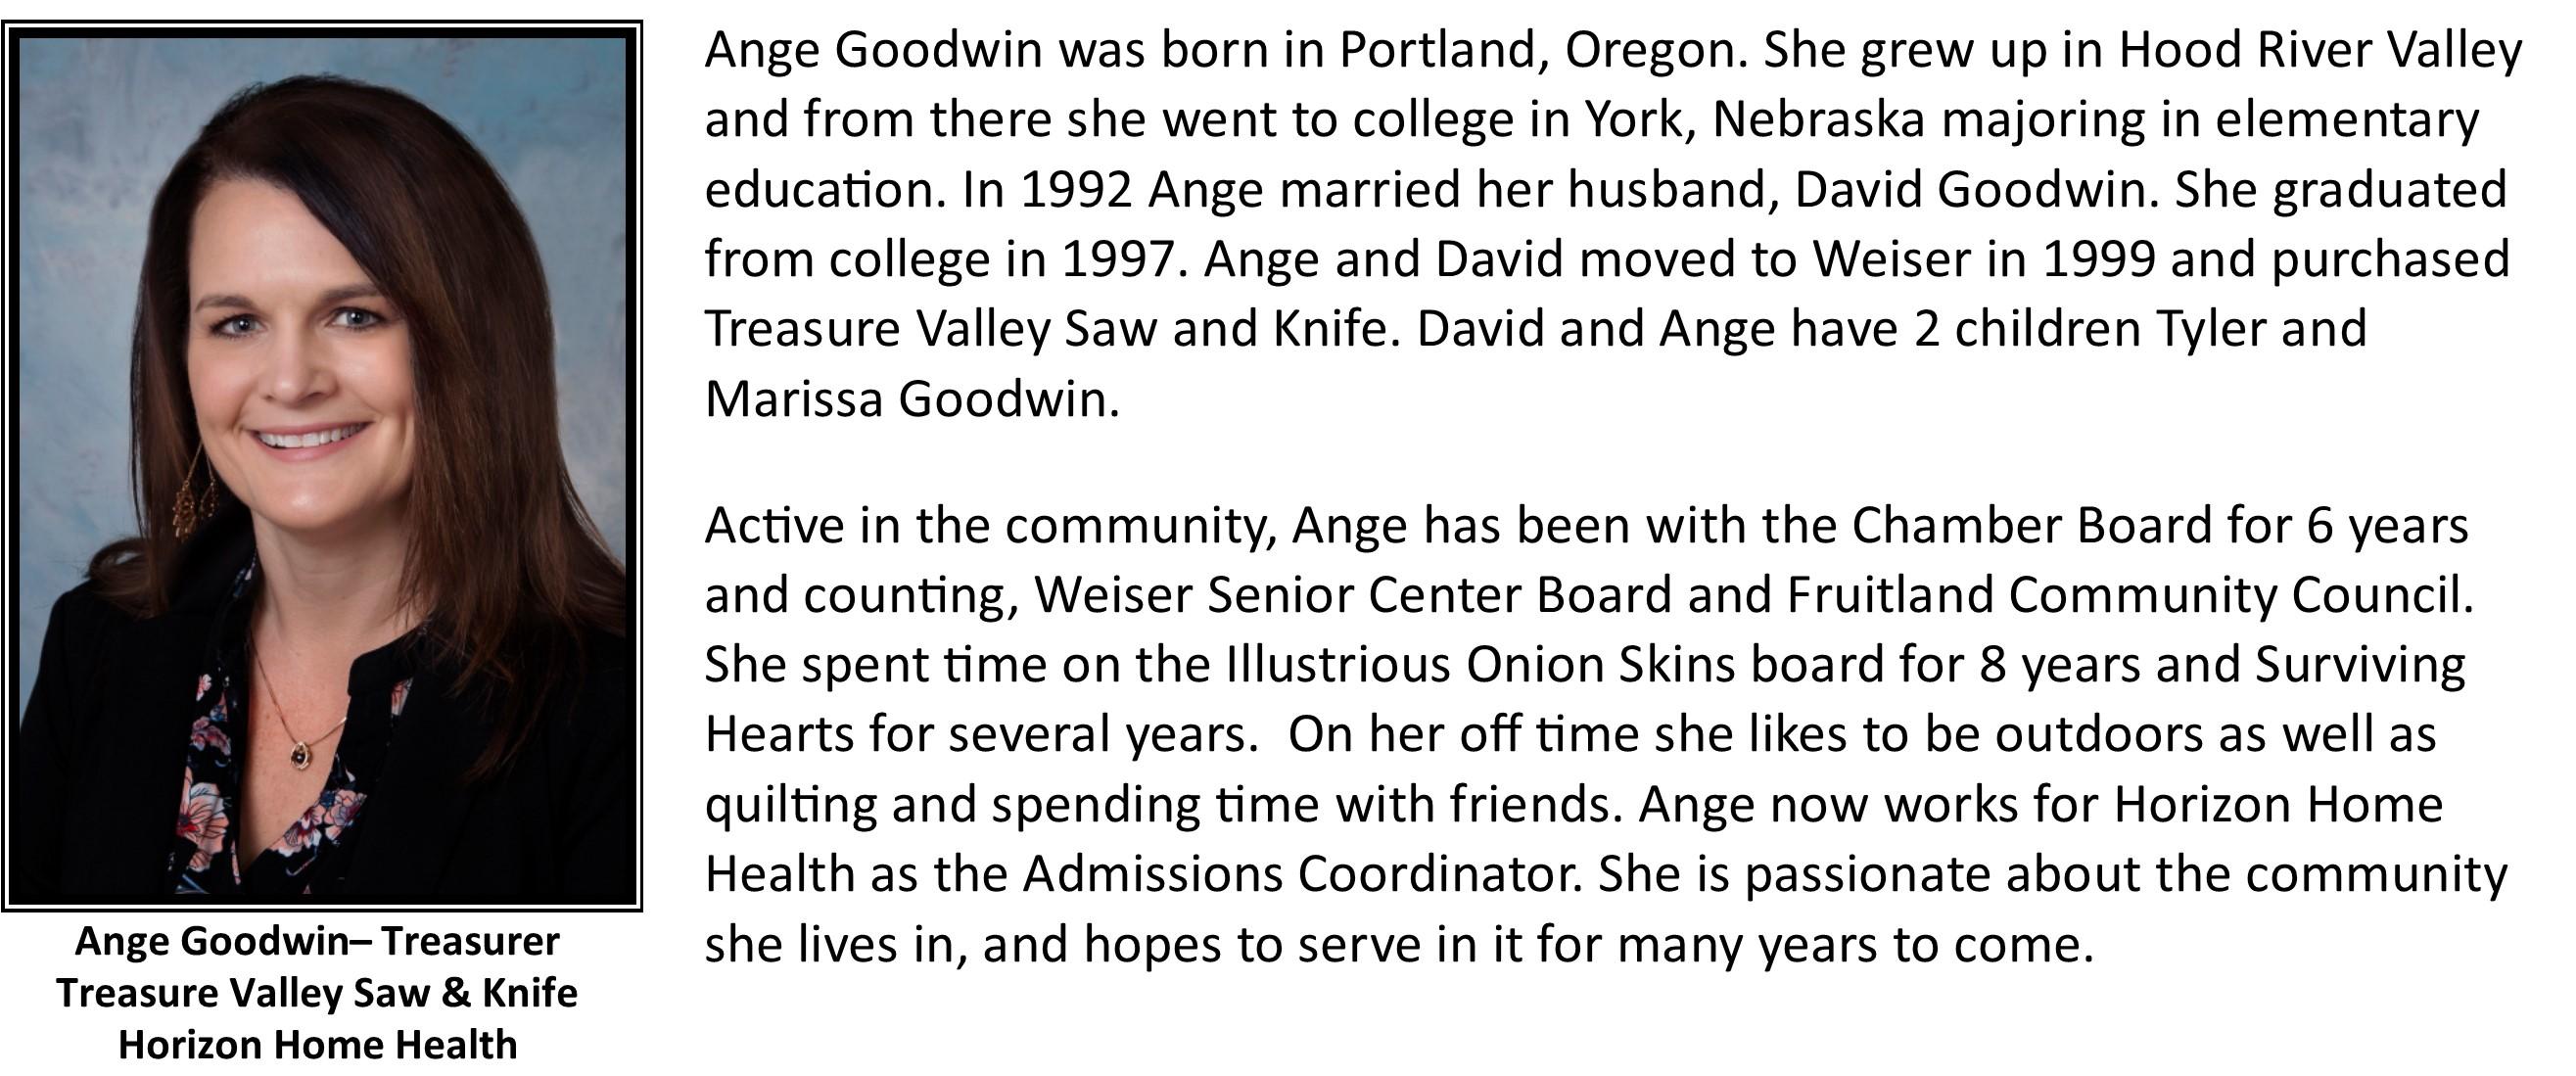 Ange Goodwin